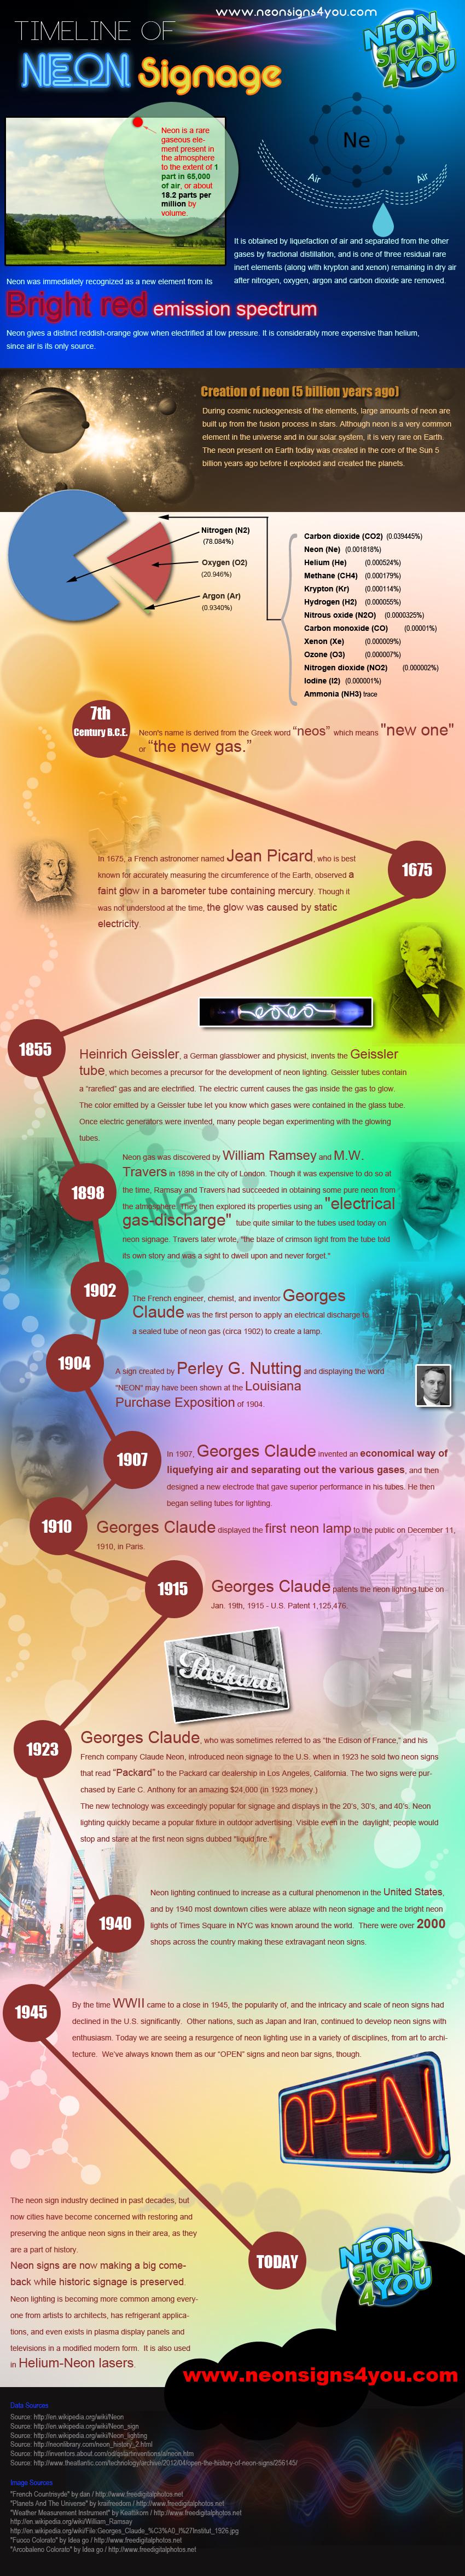 Timeline of Neon Signage